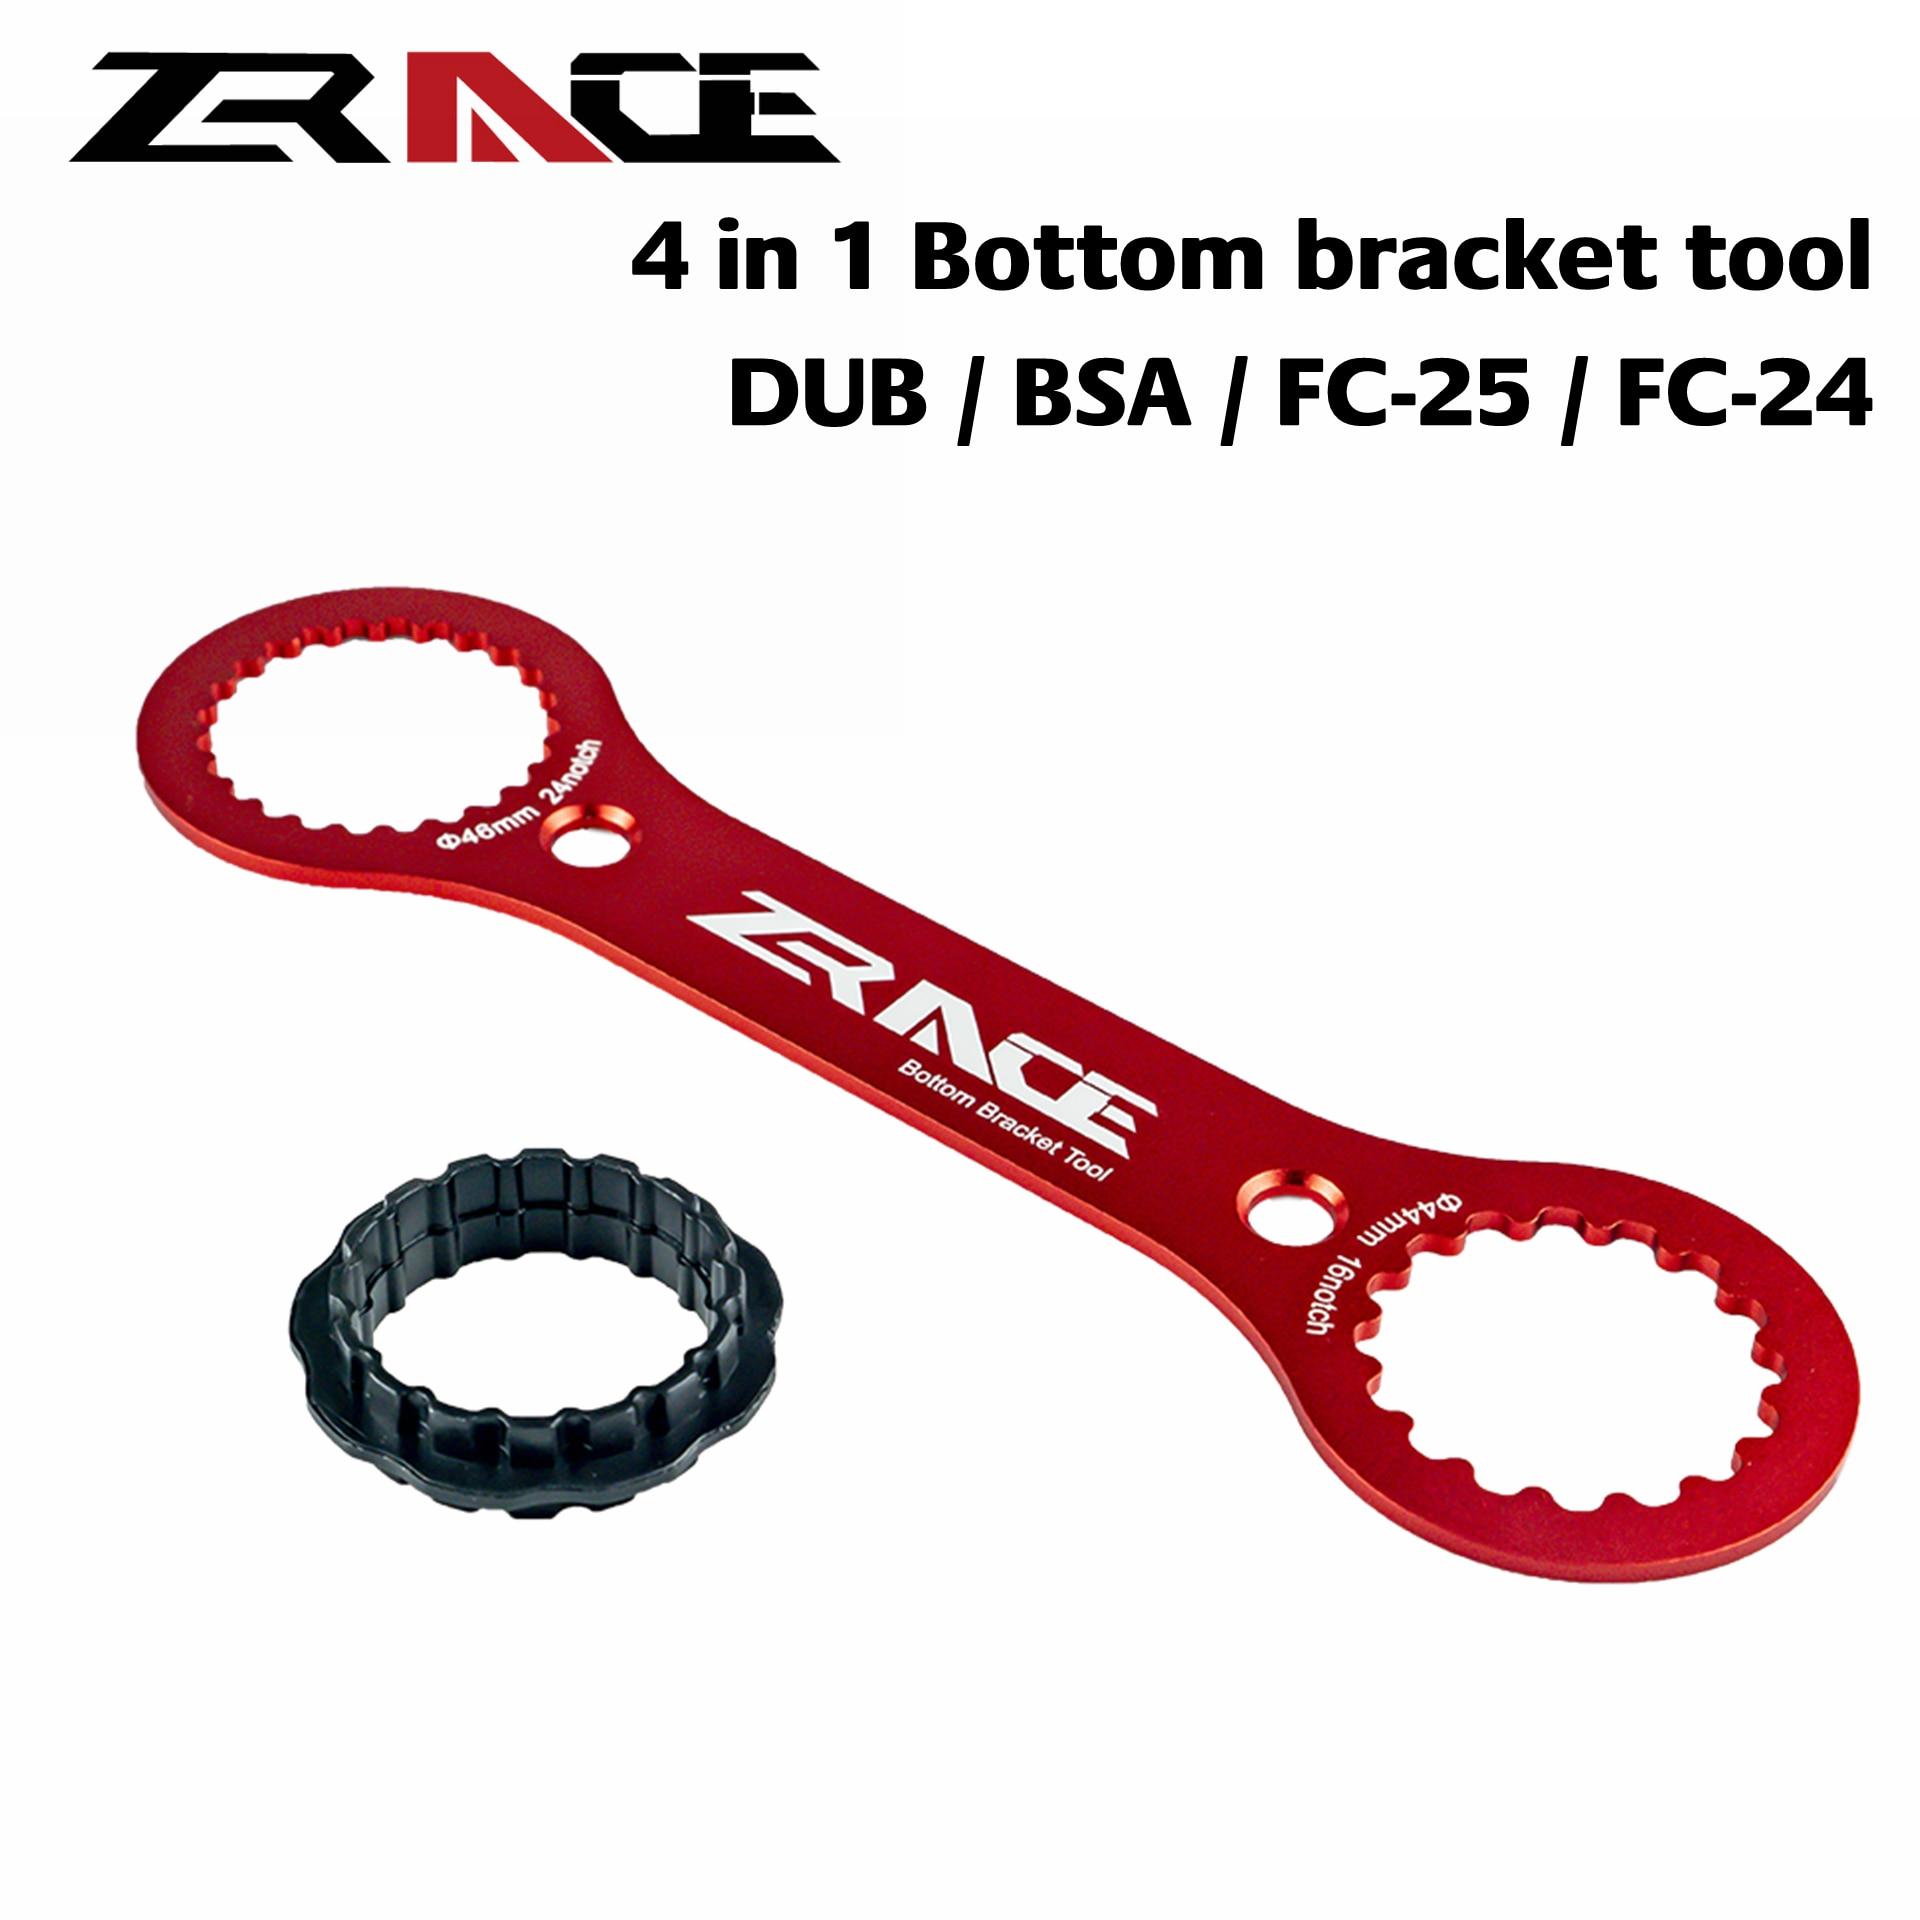 ZRACE 4 in 1 วงเล็บด้านล่างเครื่องมือประแจ,ใช้งานร่วมกับ SRAM DUB, SHIMANO BSA / FC-25 / FC-24, CNC AL7075 DUB-BSA เครื่องมือ